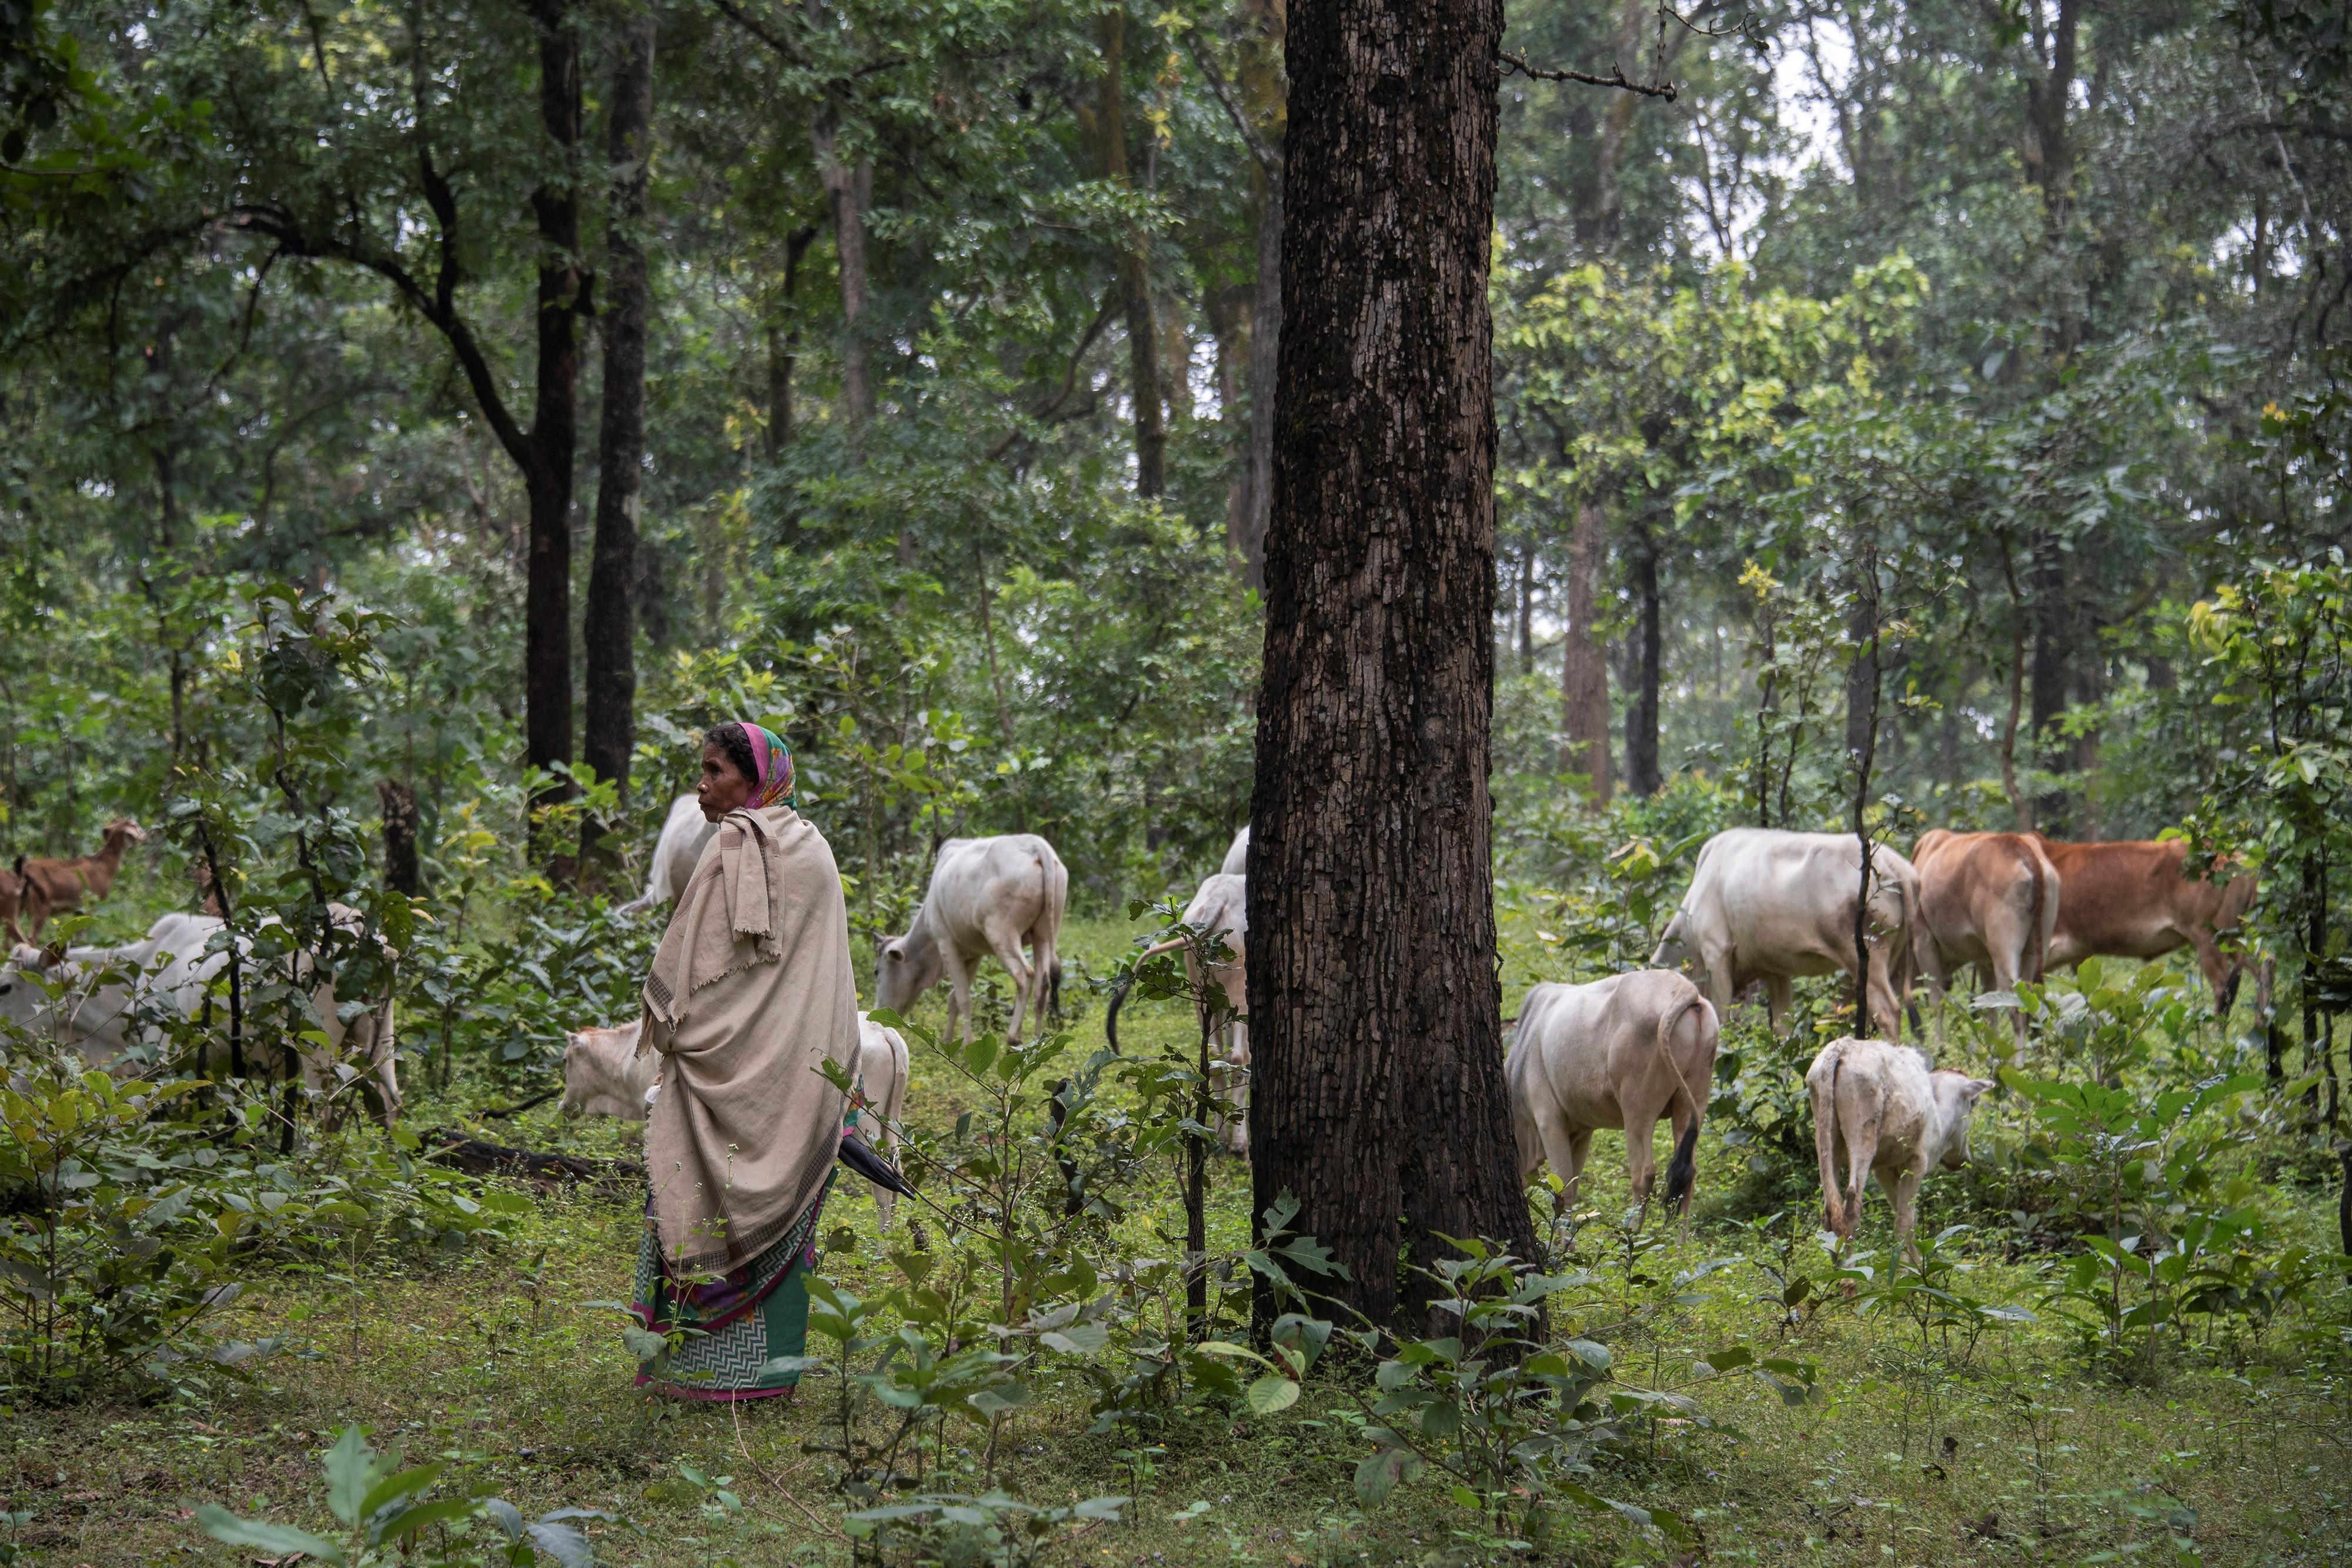 Adivasi people graze livestock in the Hasdeo forests. Image Brian Cassey www.briancasseyphotographer.com